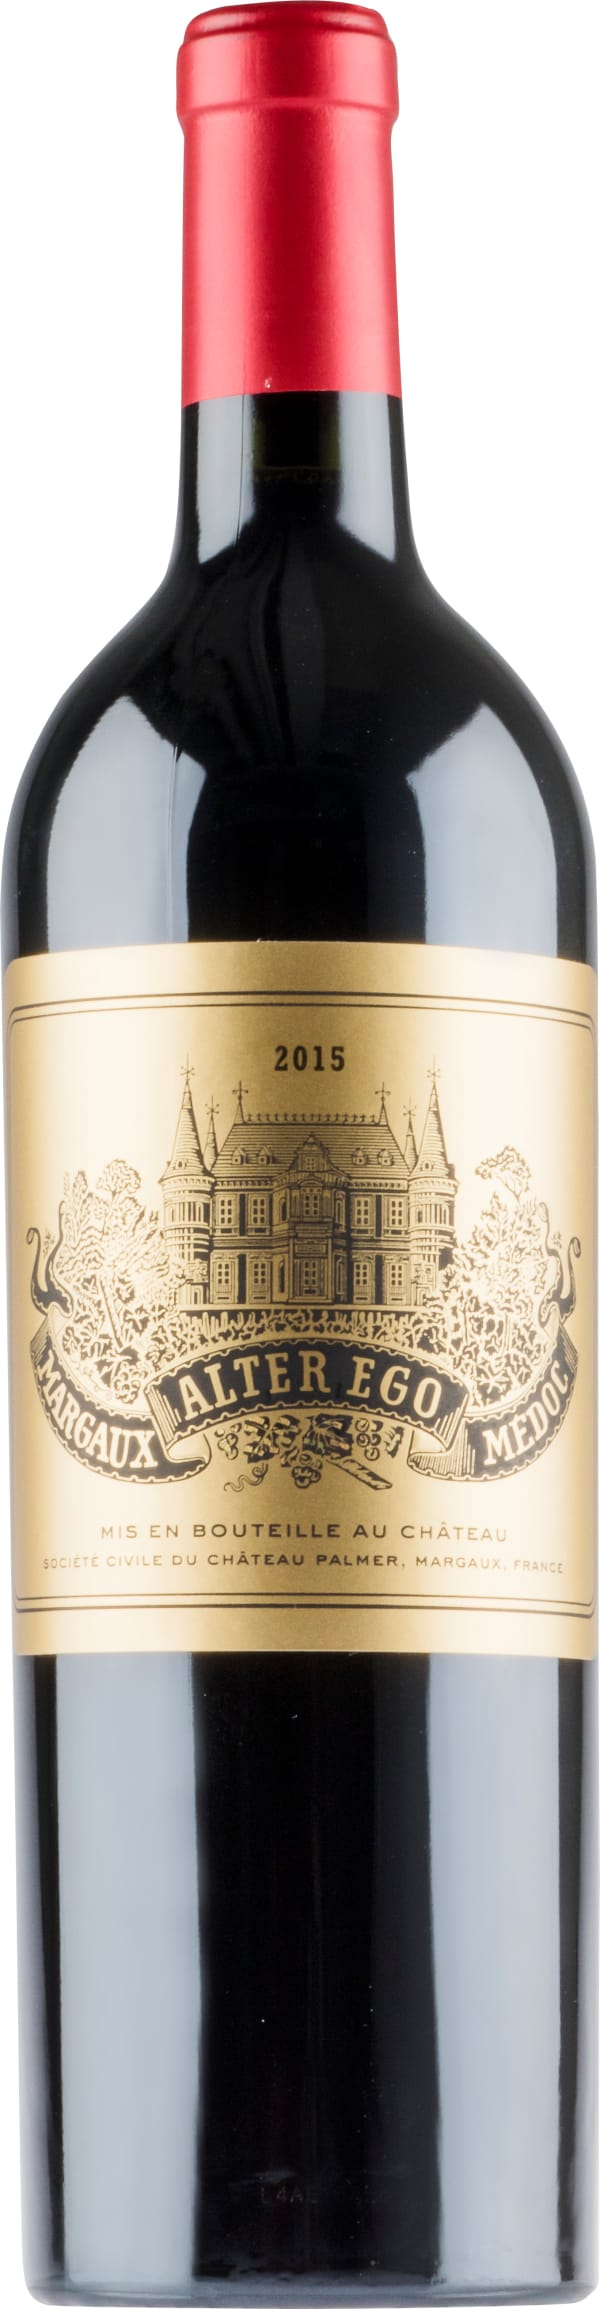 Alter Ego 2015